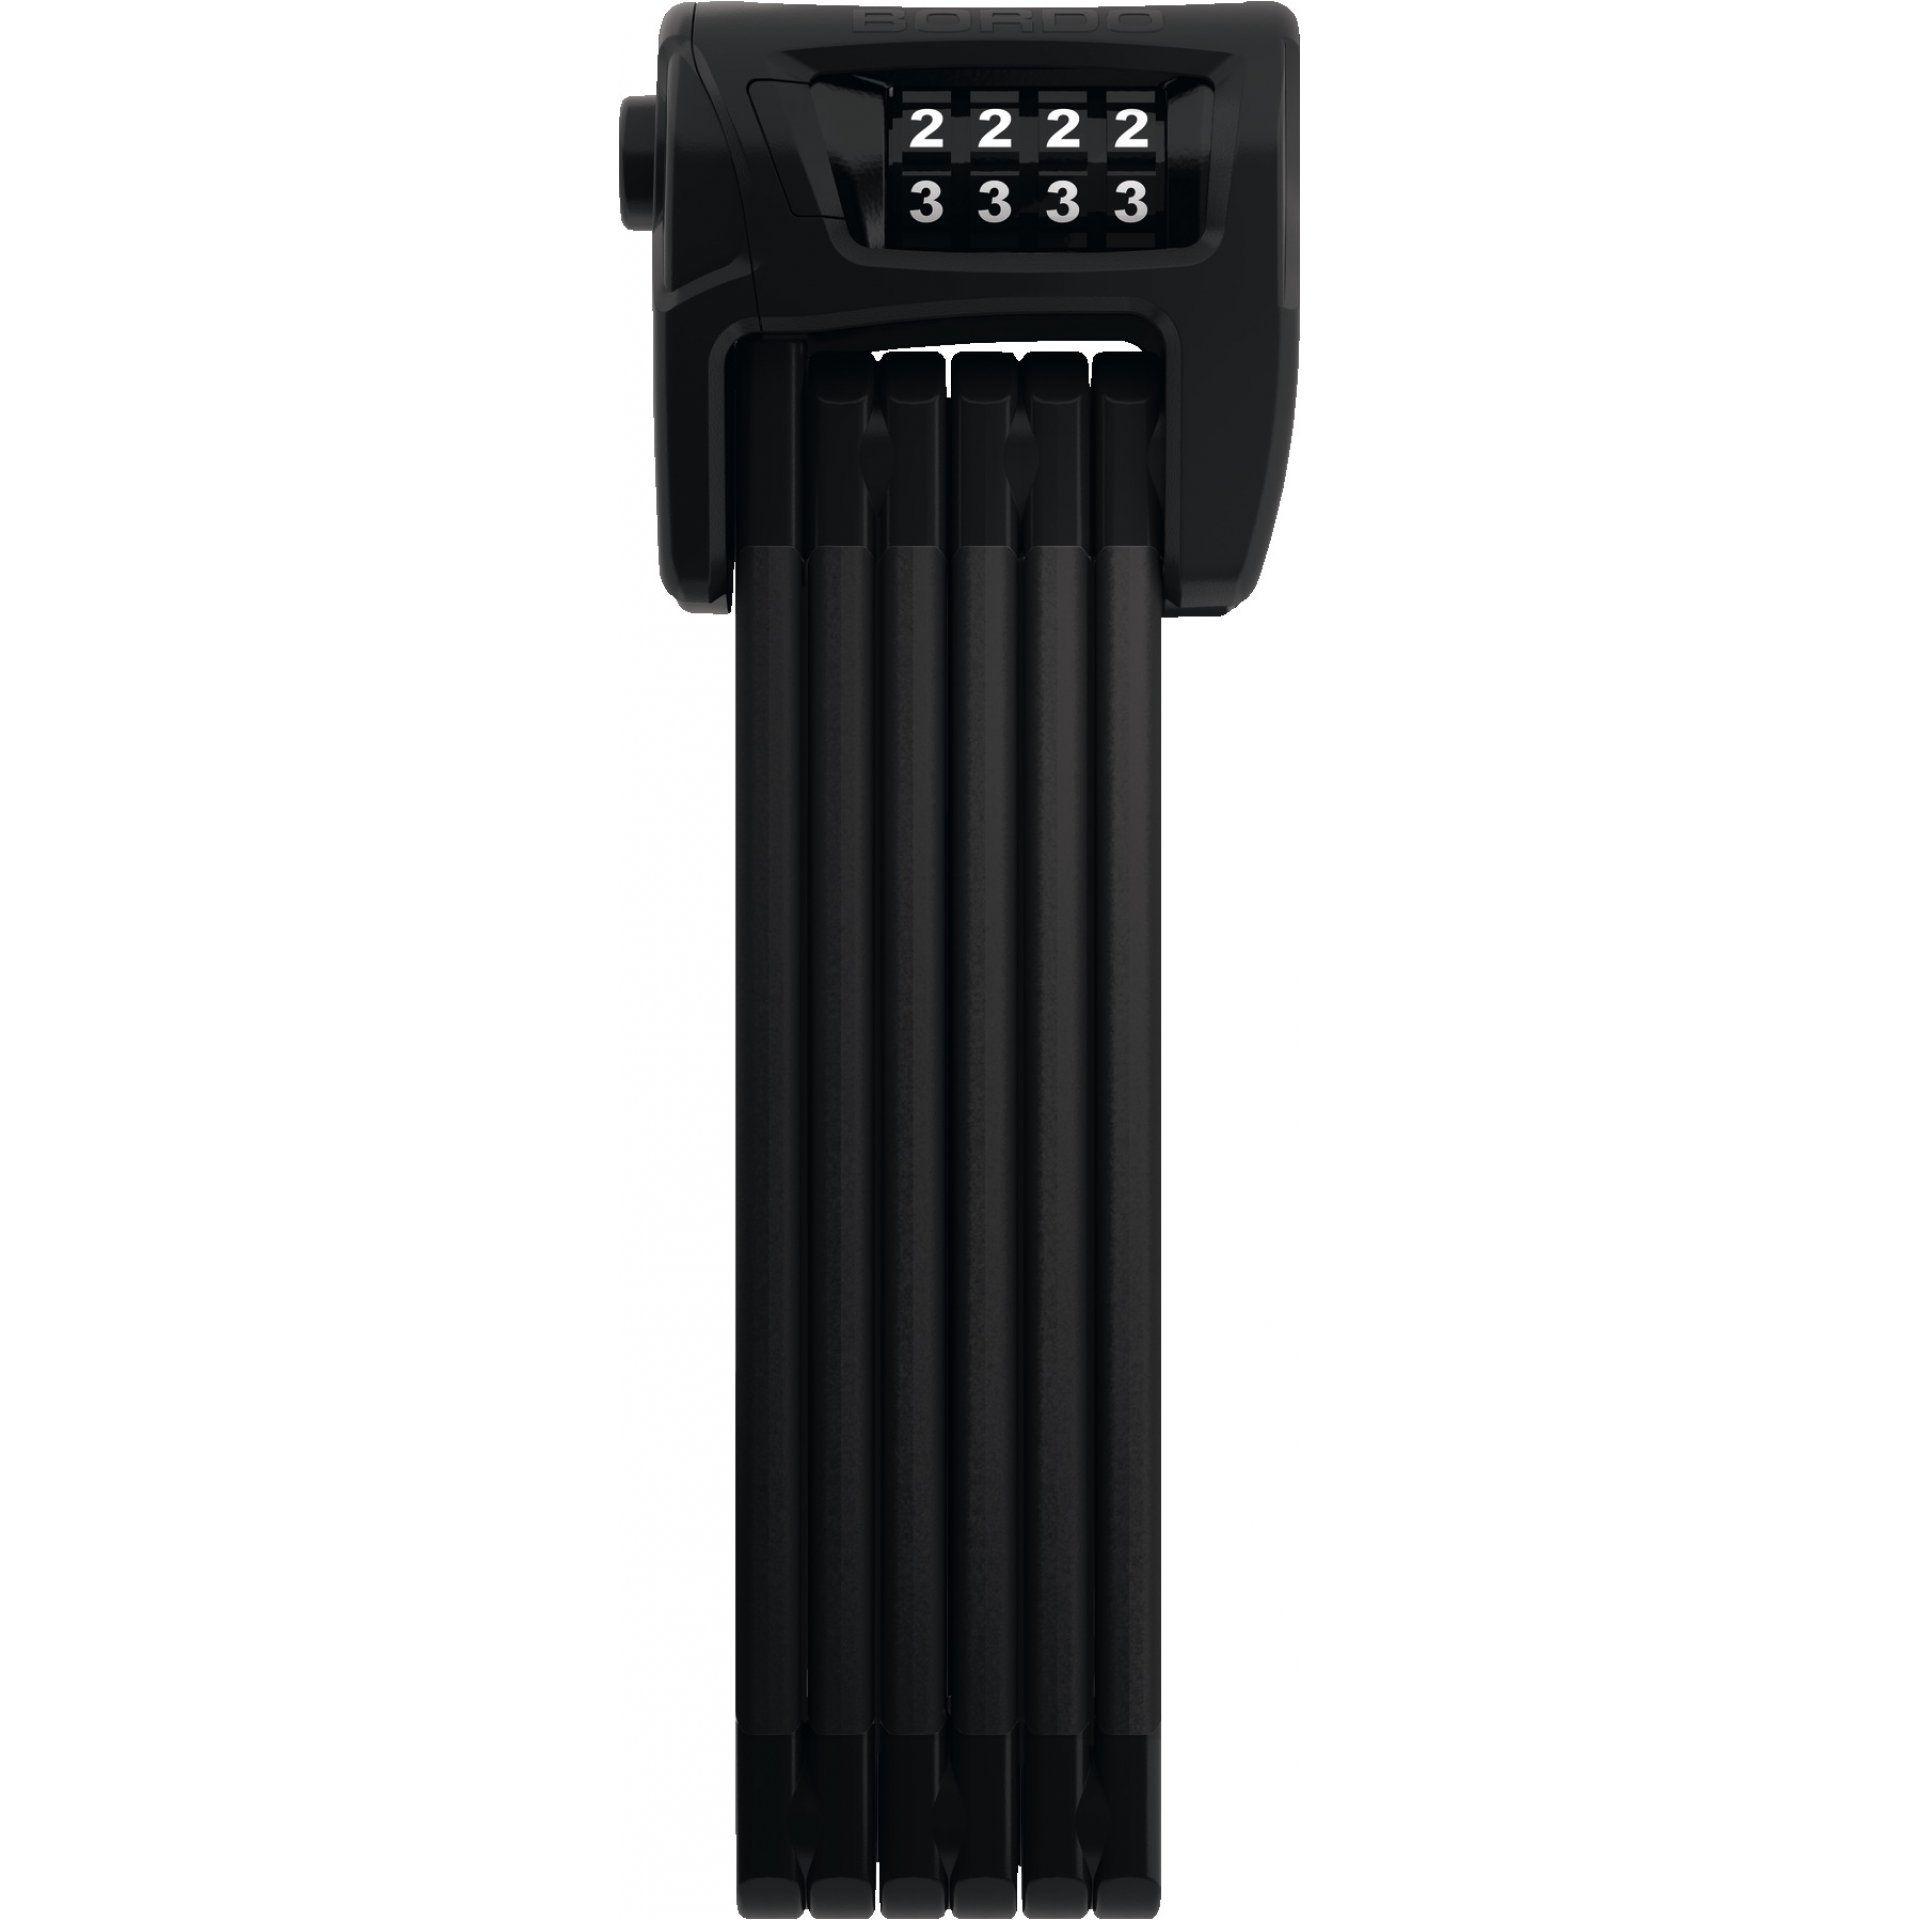 ZAPIĘCIE ROWEROWE ABUS BORDO COMBO SH 6100 90 BLACK 1